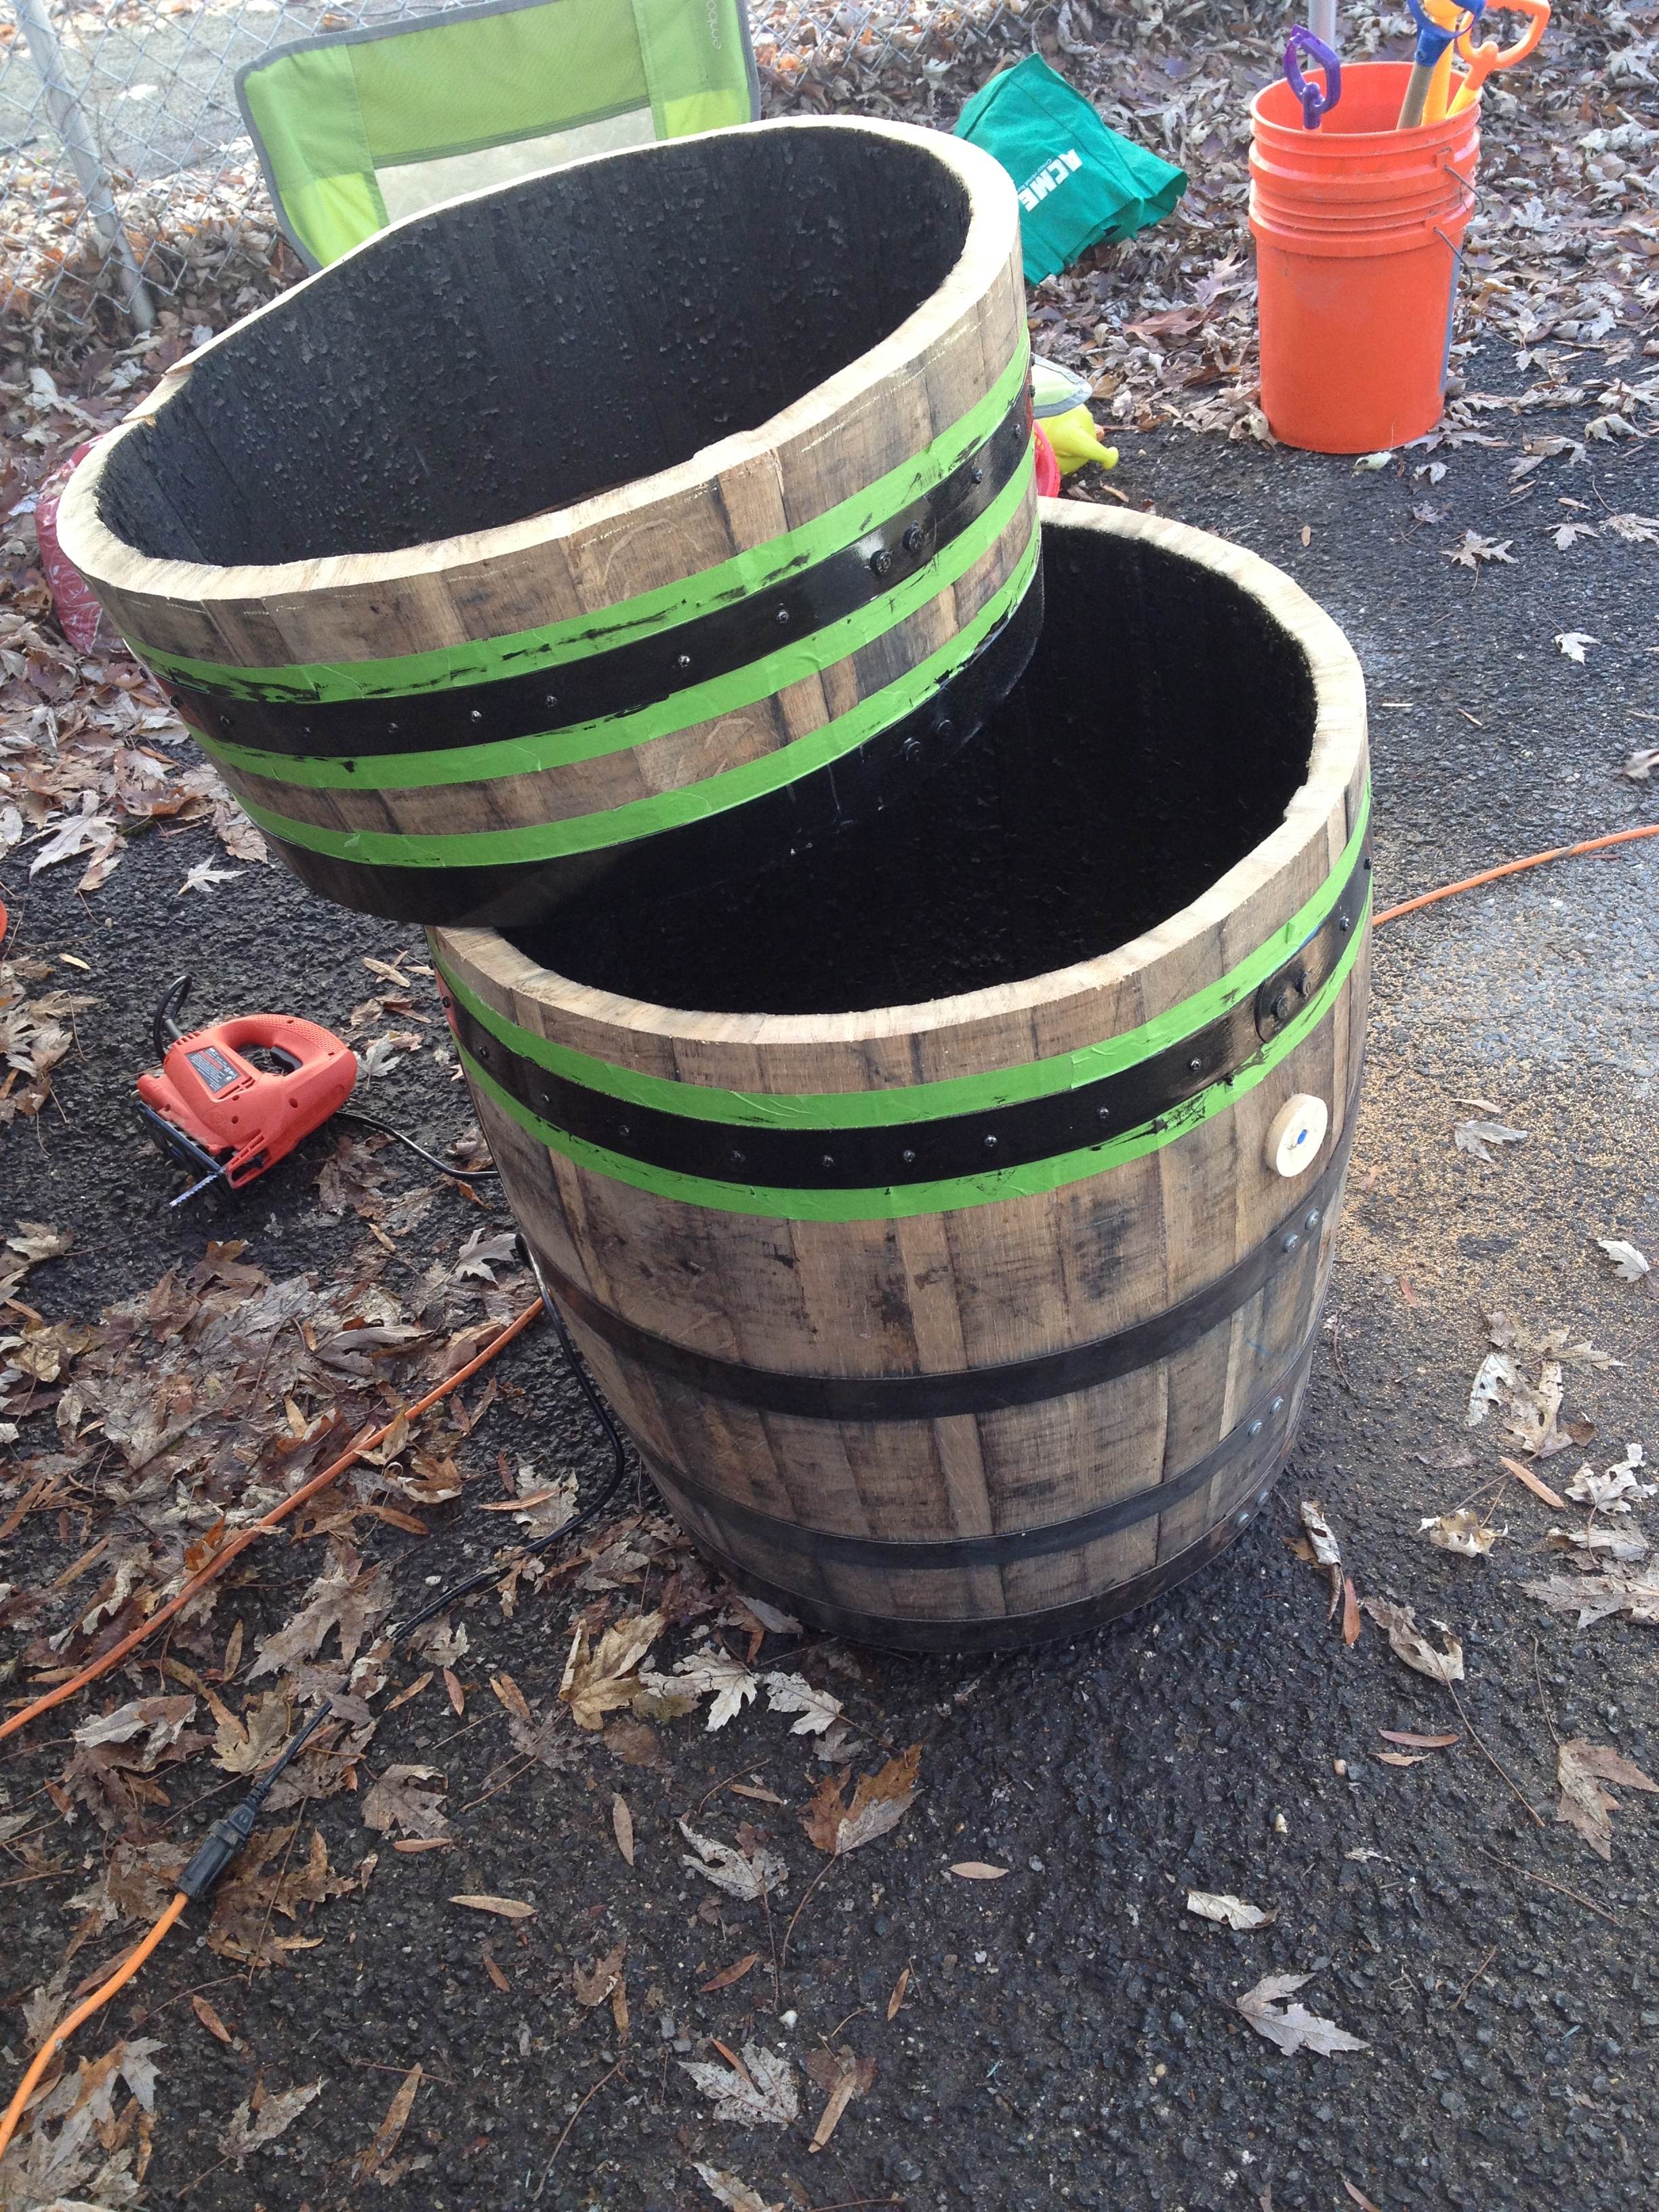 DIY: Building a Bourbon Barrel Meat Smoker – A Ph D  in Beer